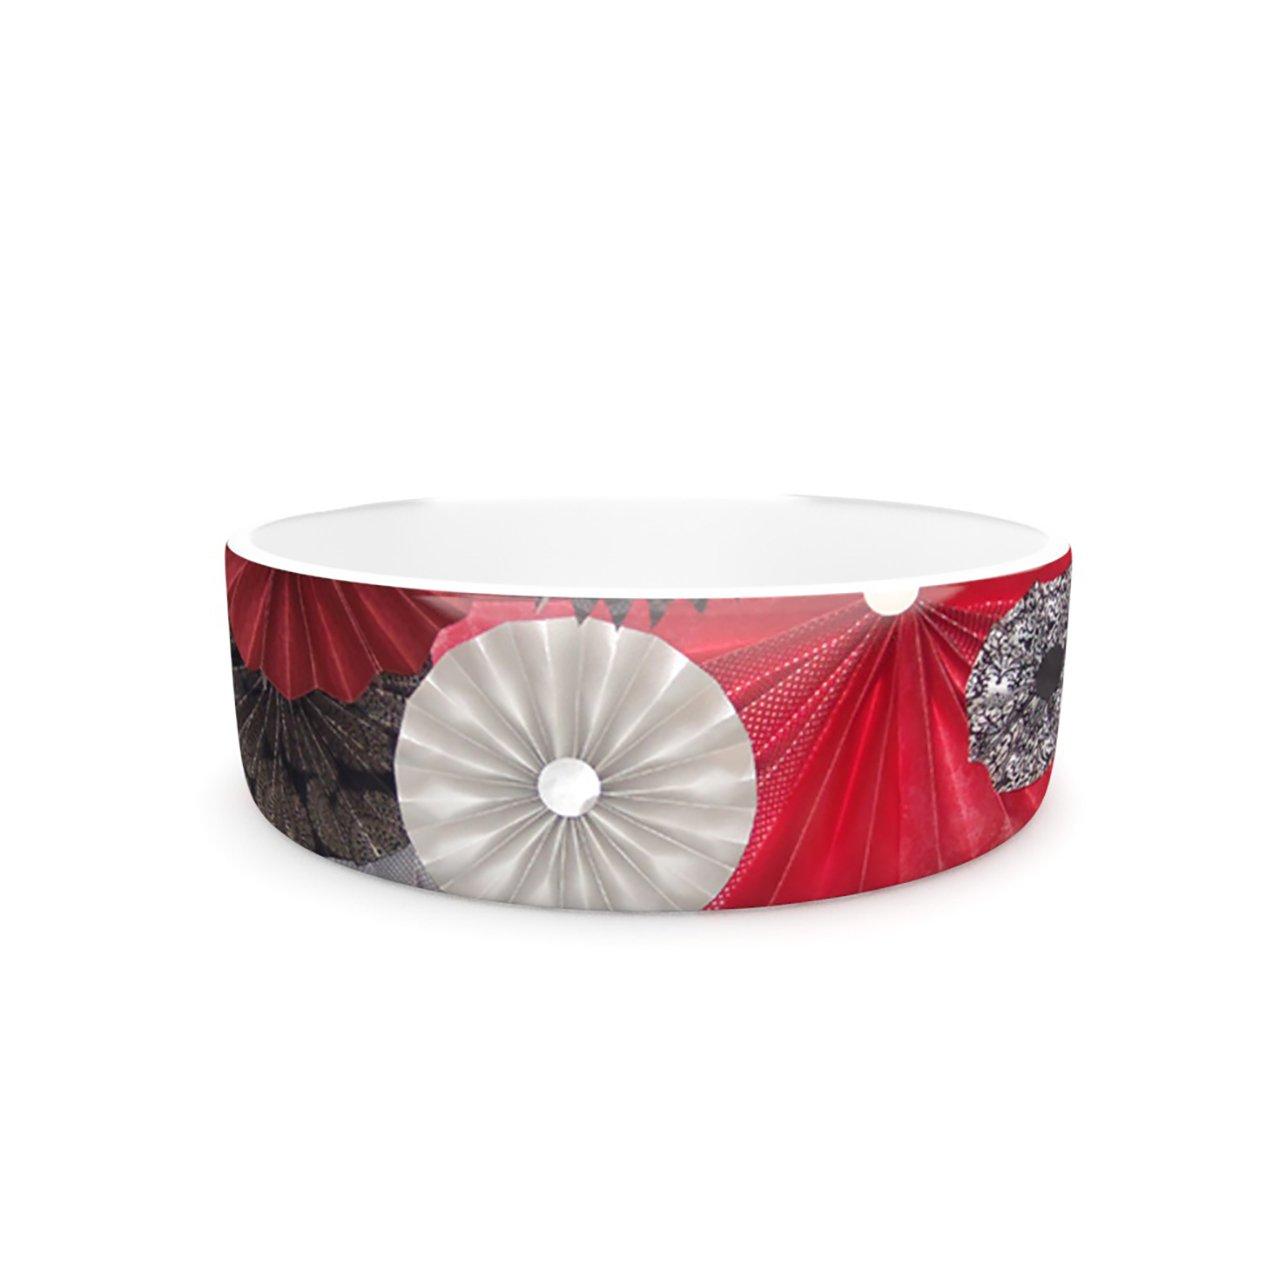 Kess InHouse Heidi Jennings Kyoto  Pet Bowl, 7-Inch, Red Black